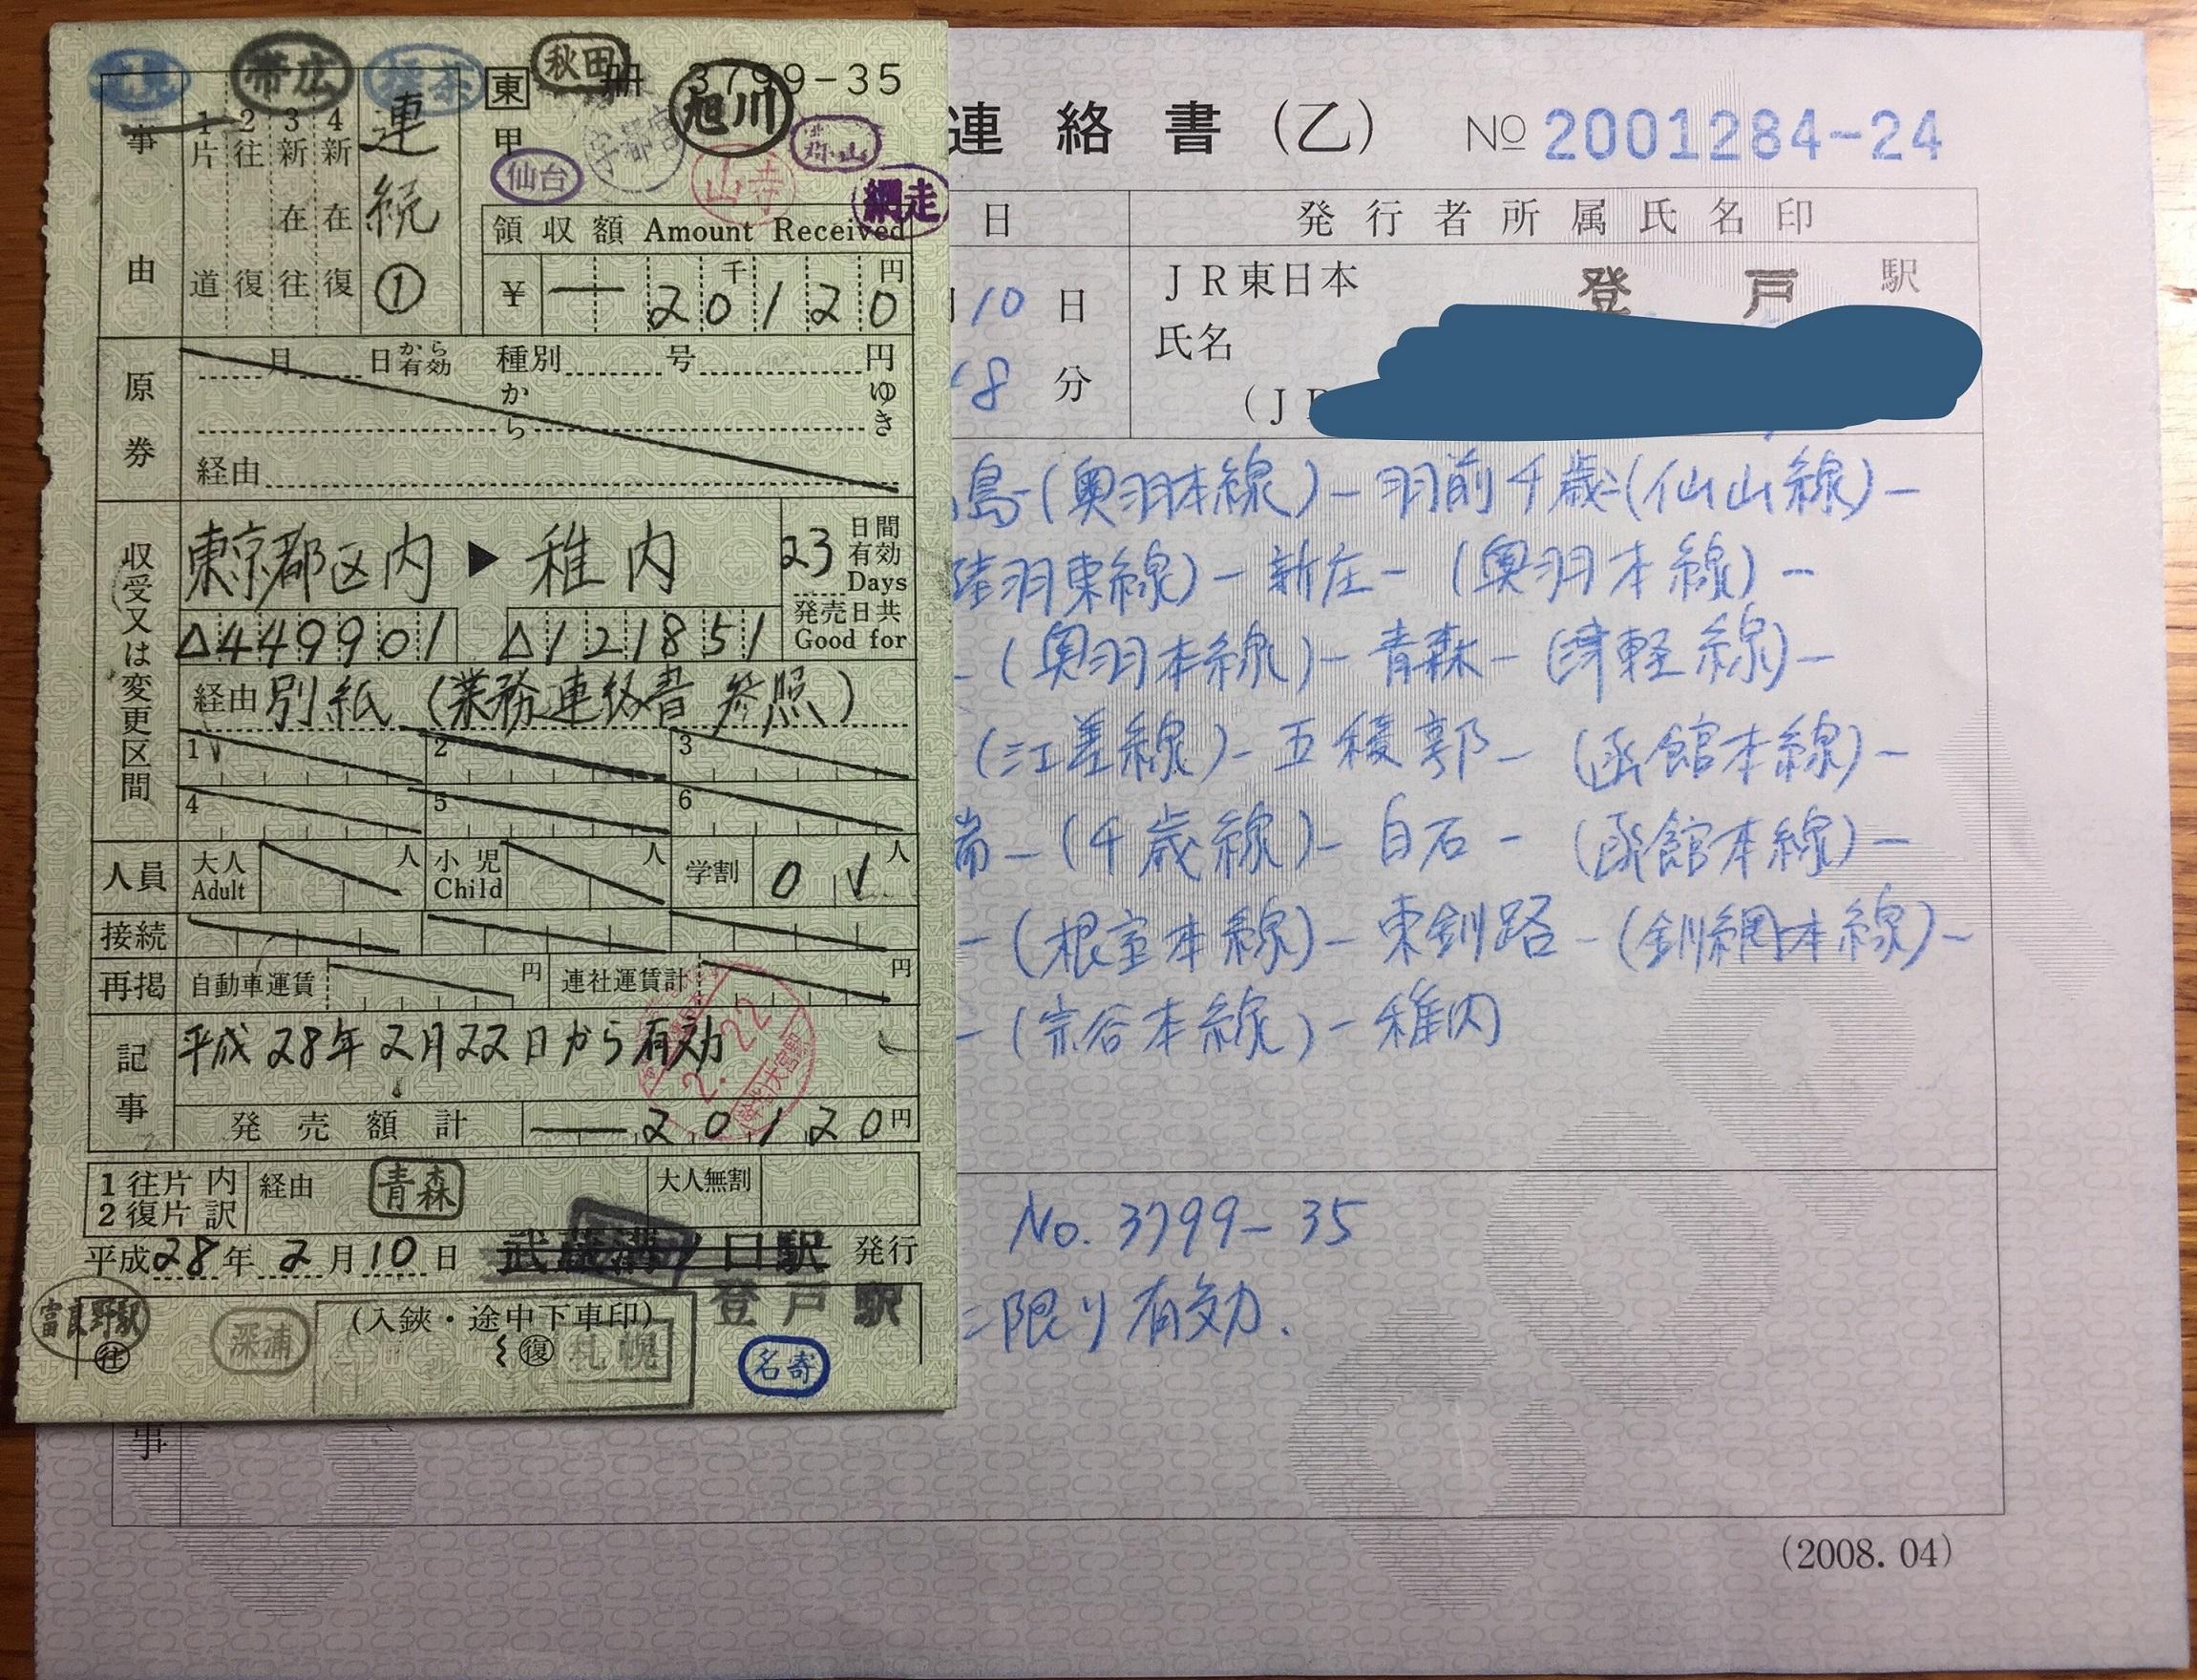 JRの出札補充券と稚内駅硬券入場券 - 鉄路と雑事